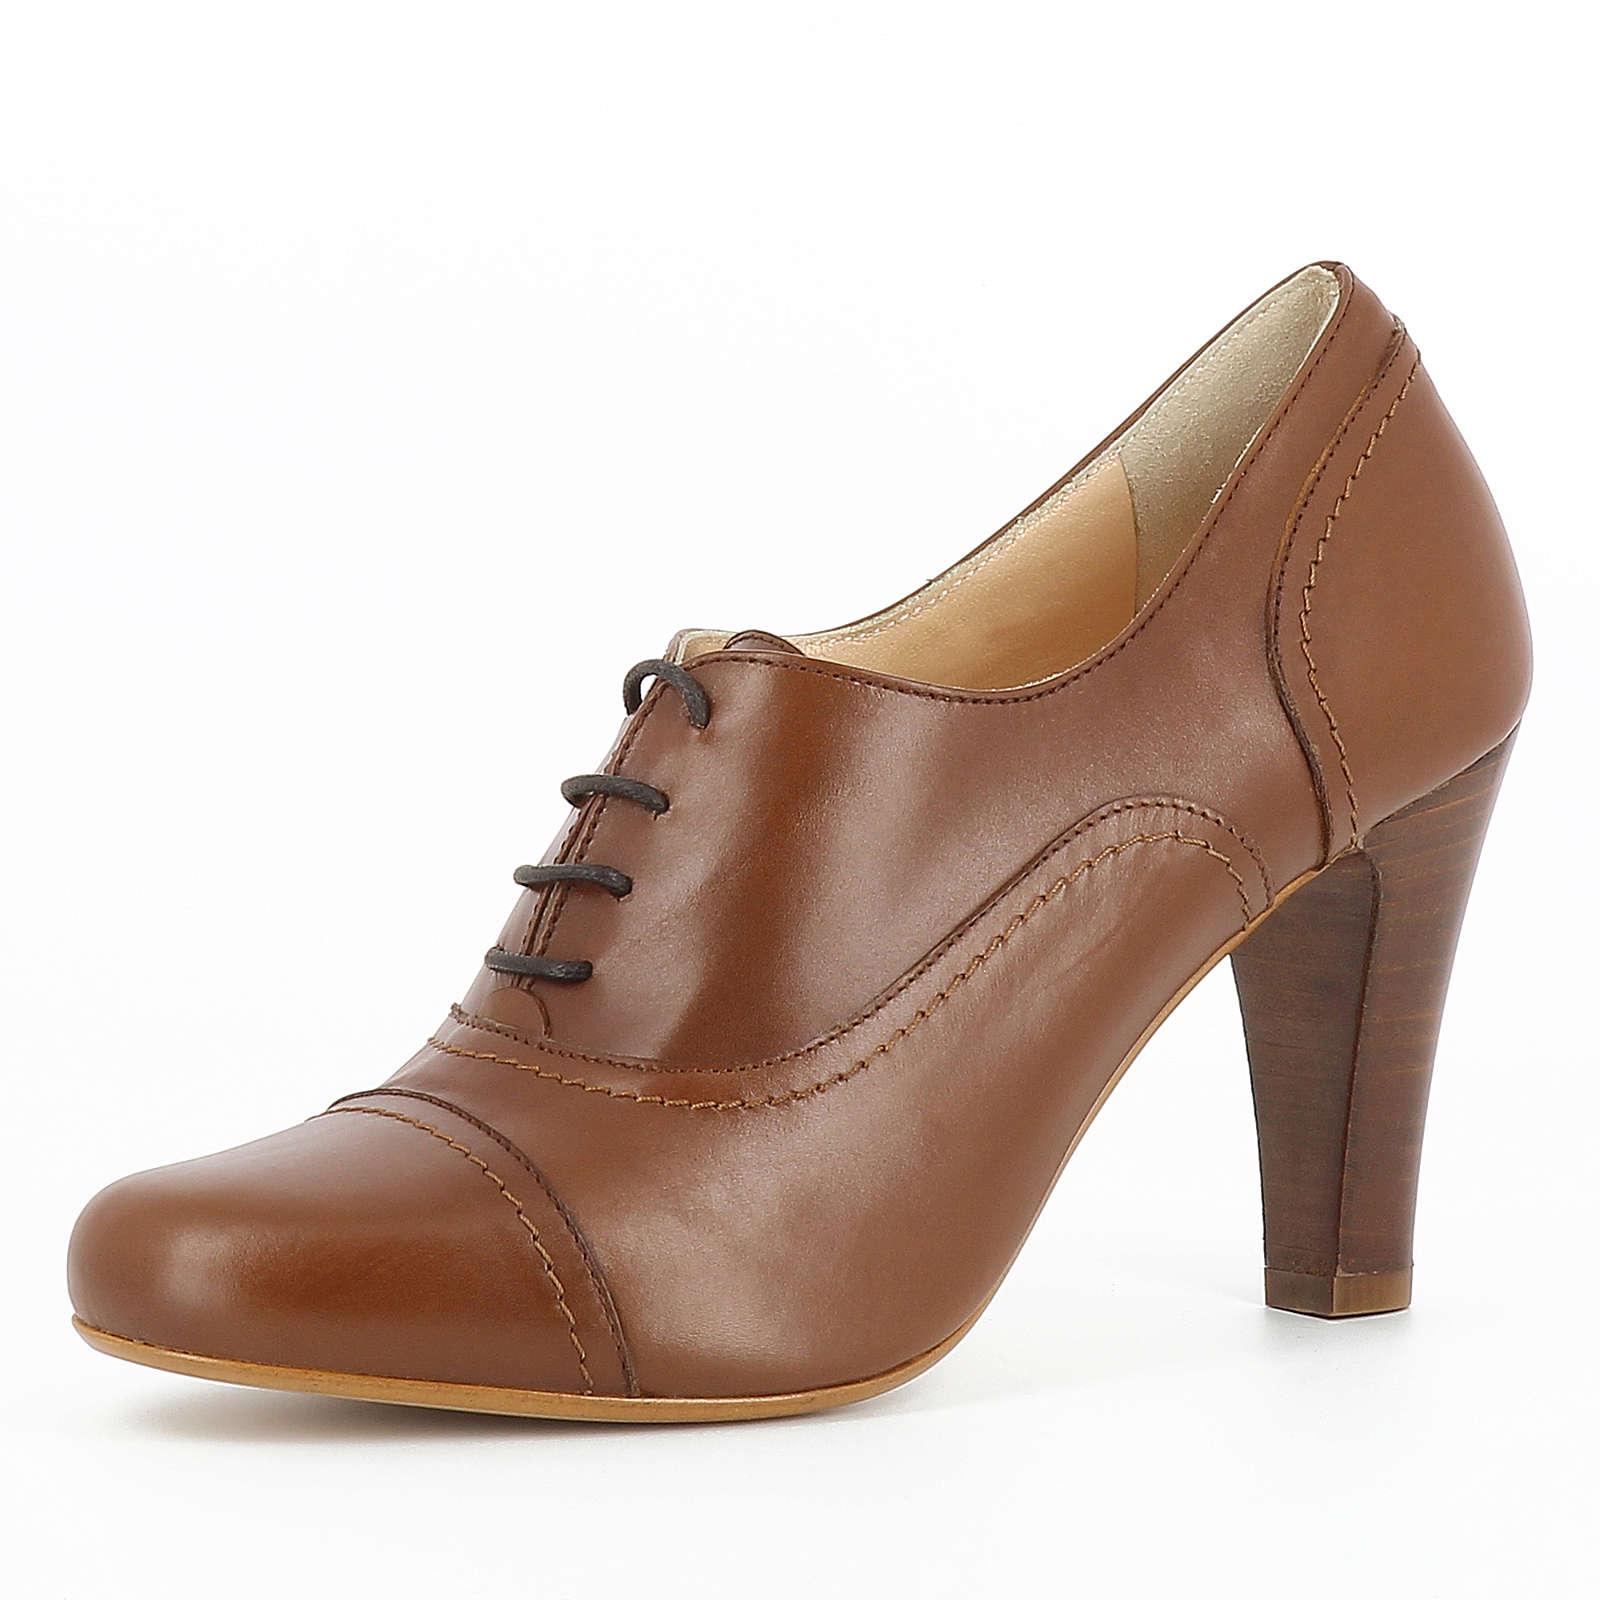 Evita Shoes MARIA Schnürpumps cognac Damen Gr. 34